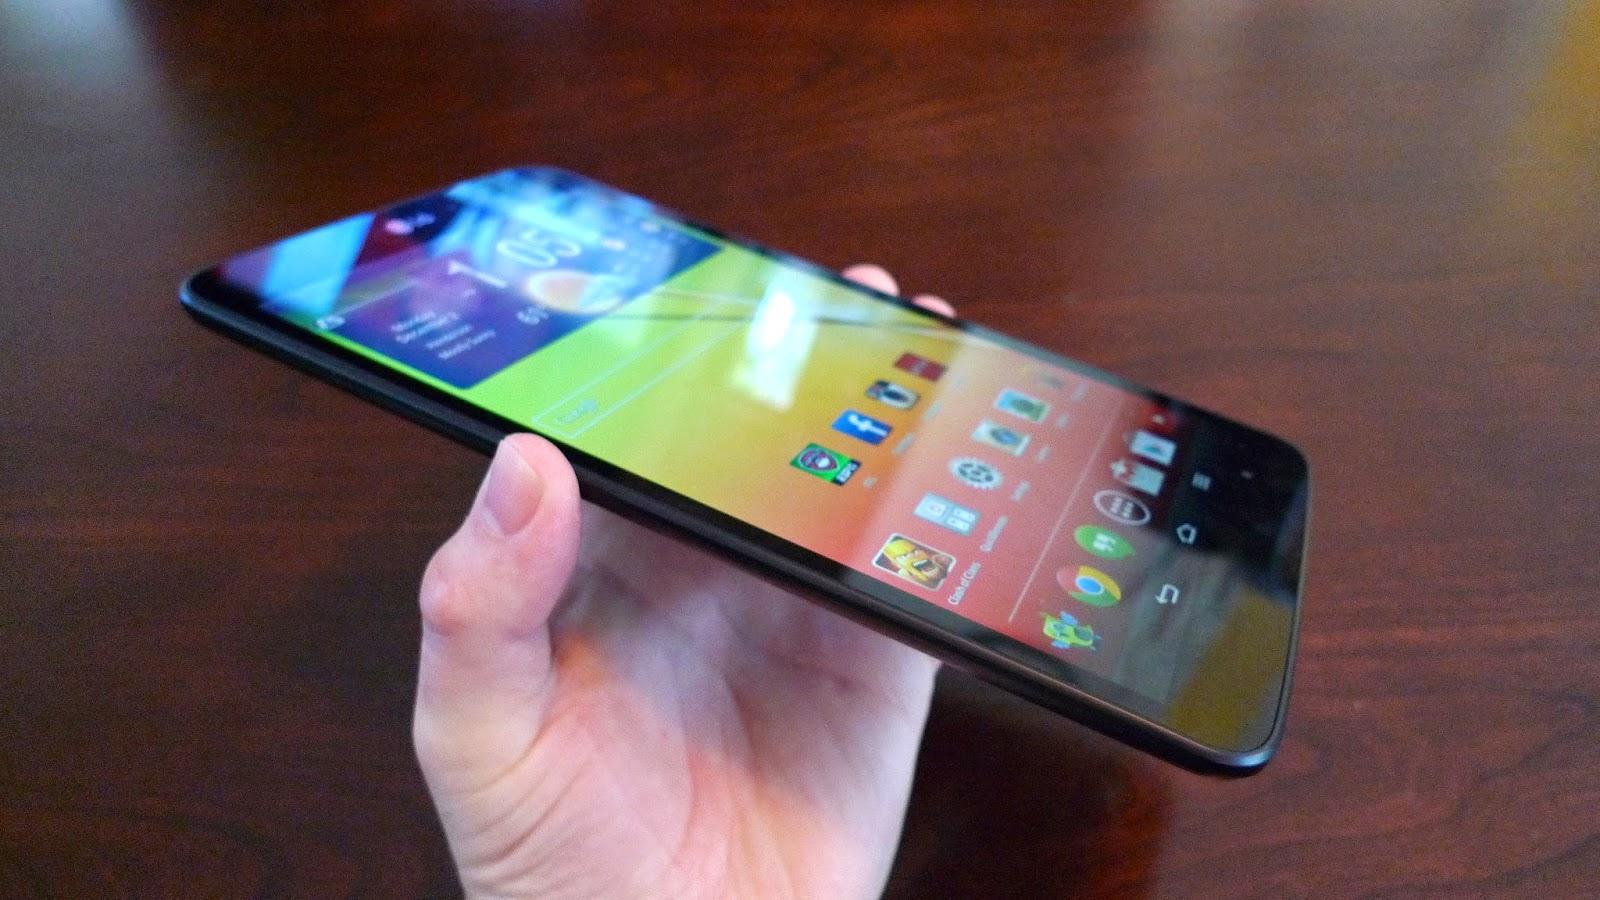 LG G Pad 8.3 Tablet Quad-core 2gb RAM 1